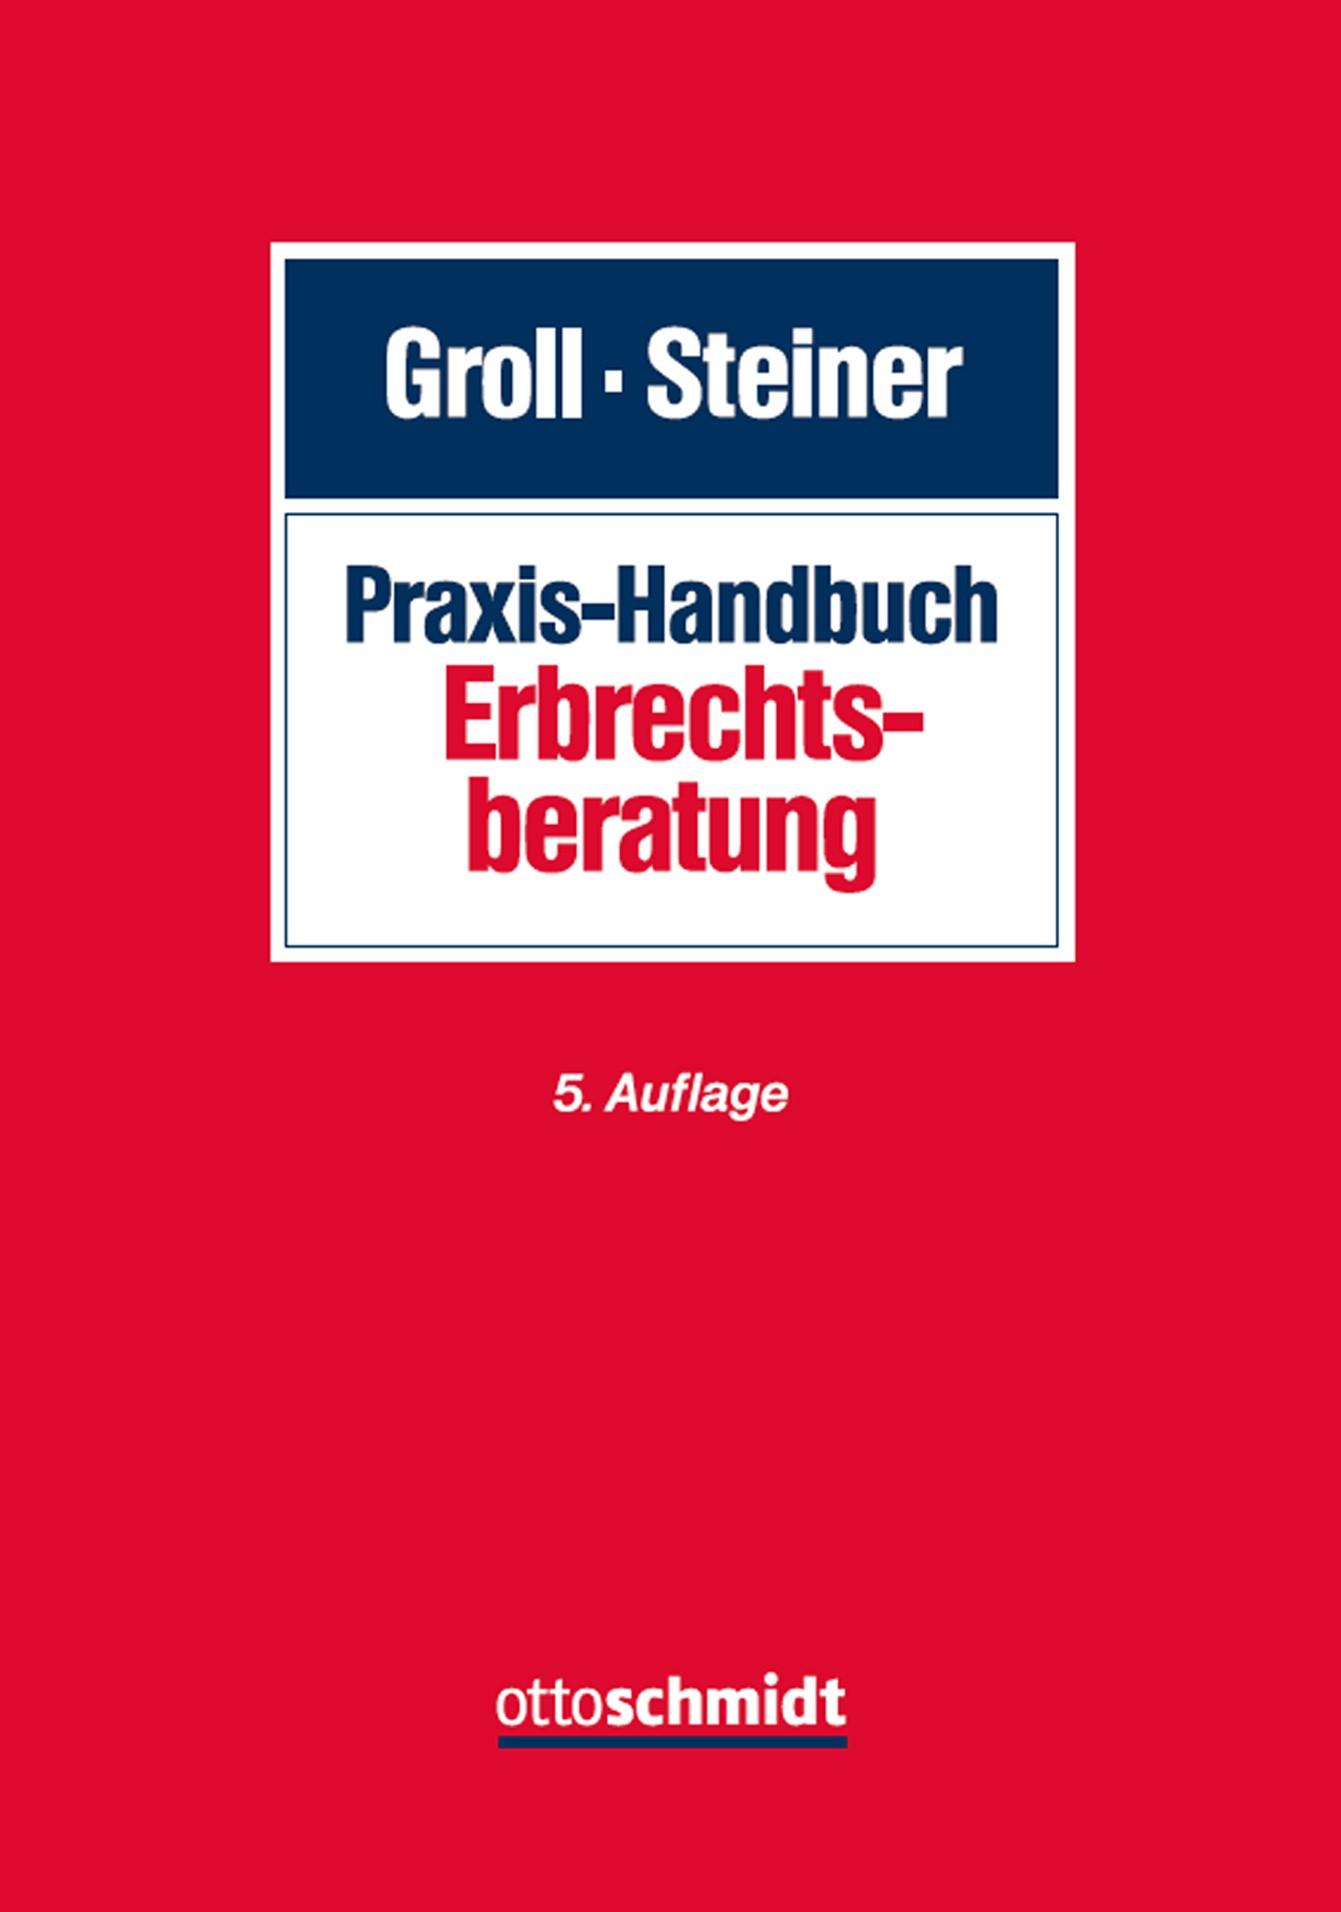 Praxis-Handbuch Erbrechtsberatung | Groll / Steiner (Hrsg.) | 5., neu bearbeitete Auflage, 2019 | Buch (Cover)